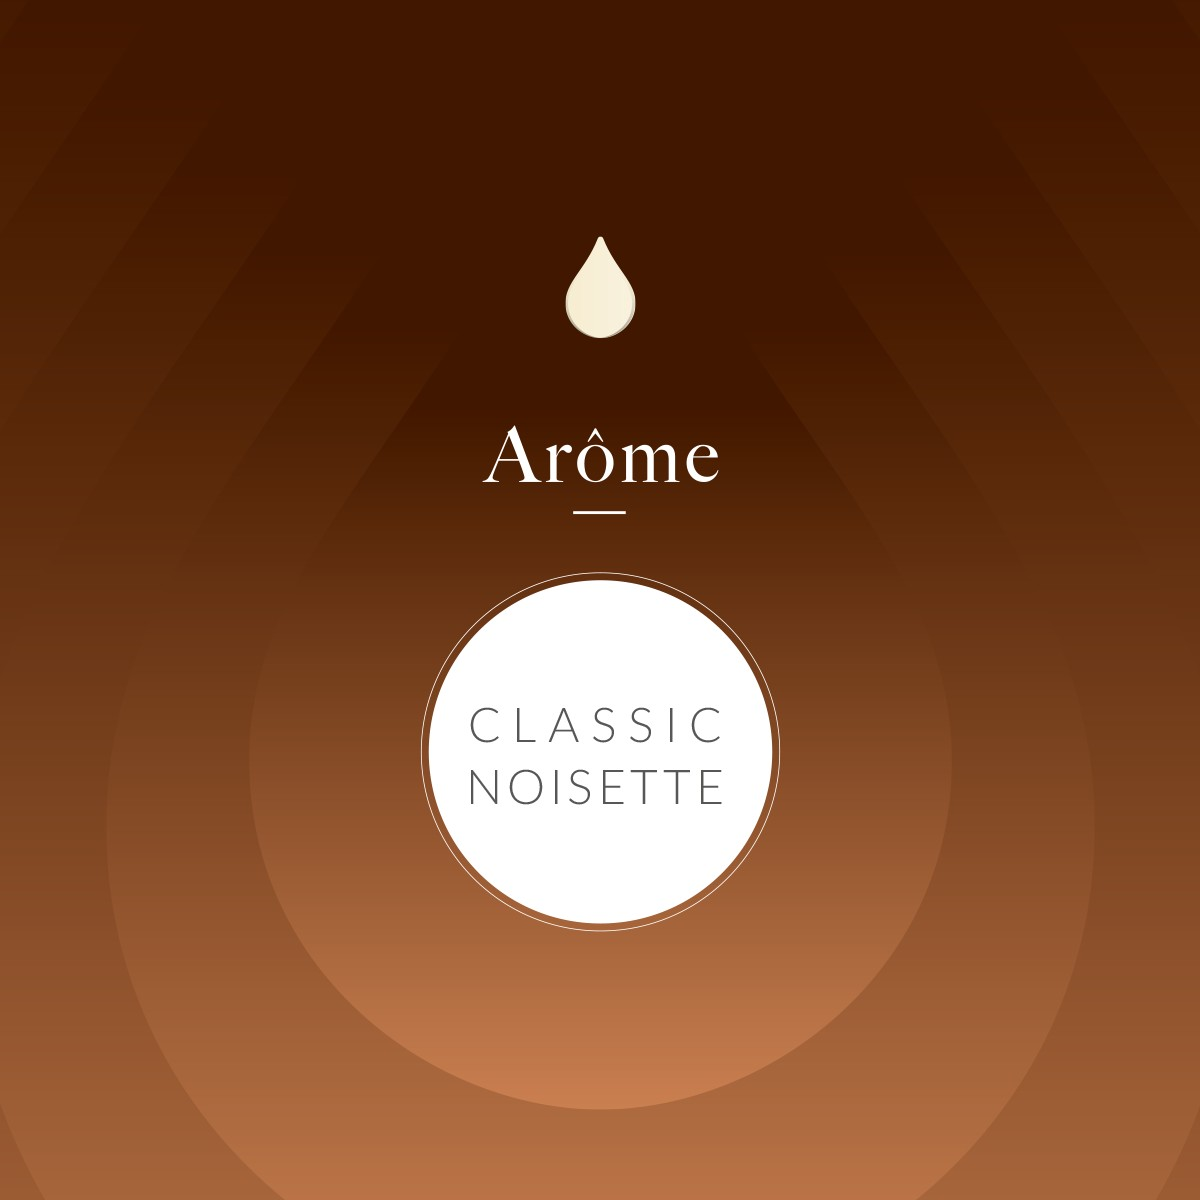 Classic Noisette